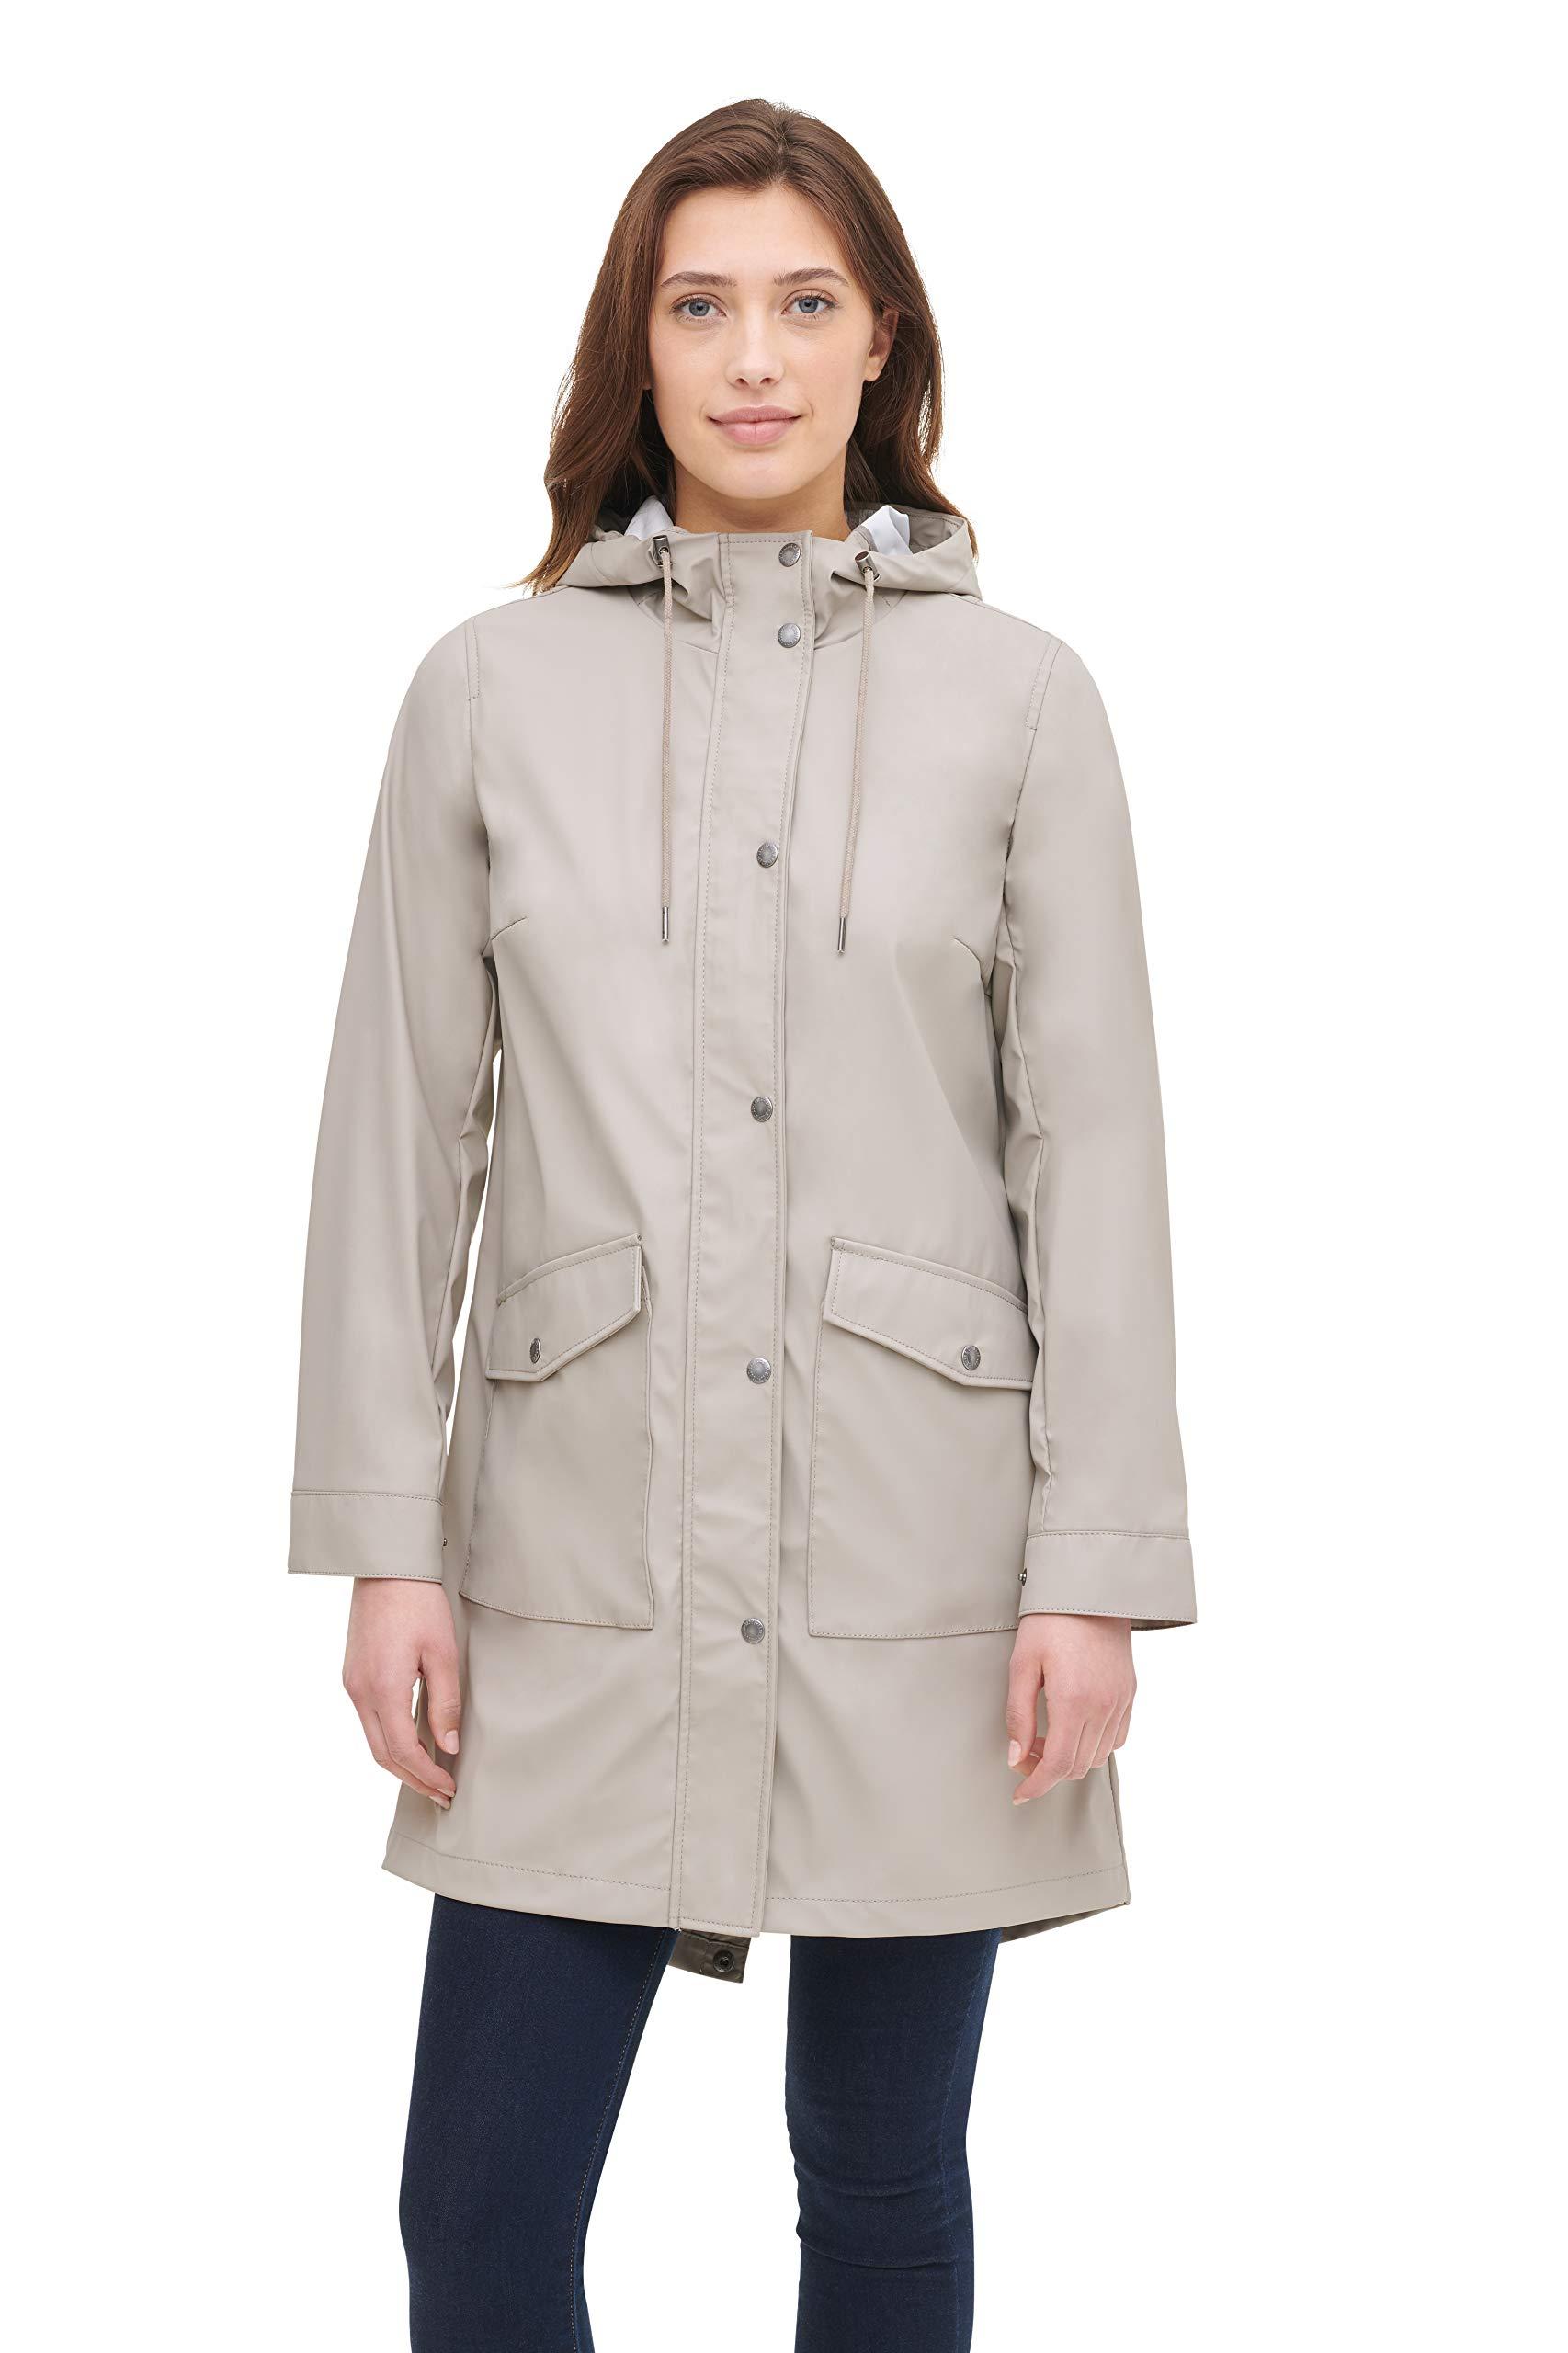 Levi's Women's Lightweight Rubberized PU Fishtail Rain Anorak Parka Jacket, Sand, Large by Levi's